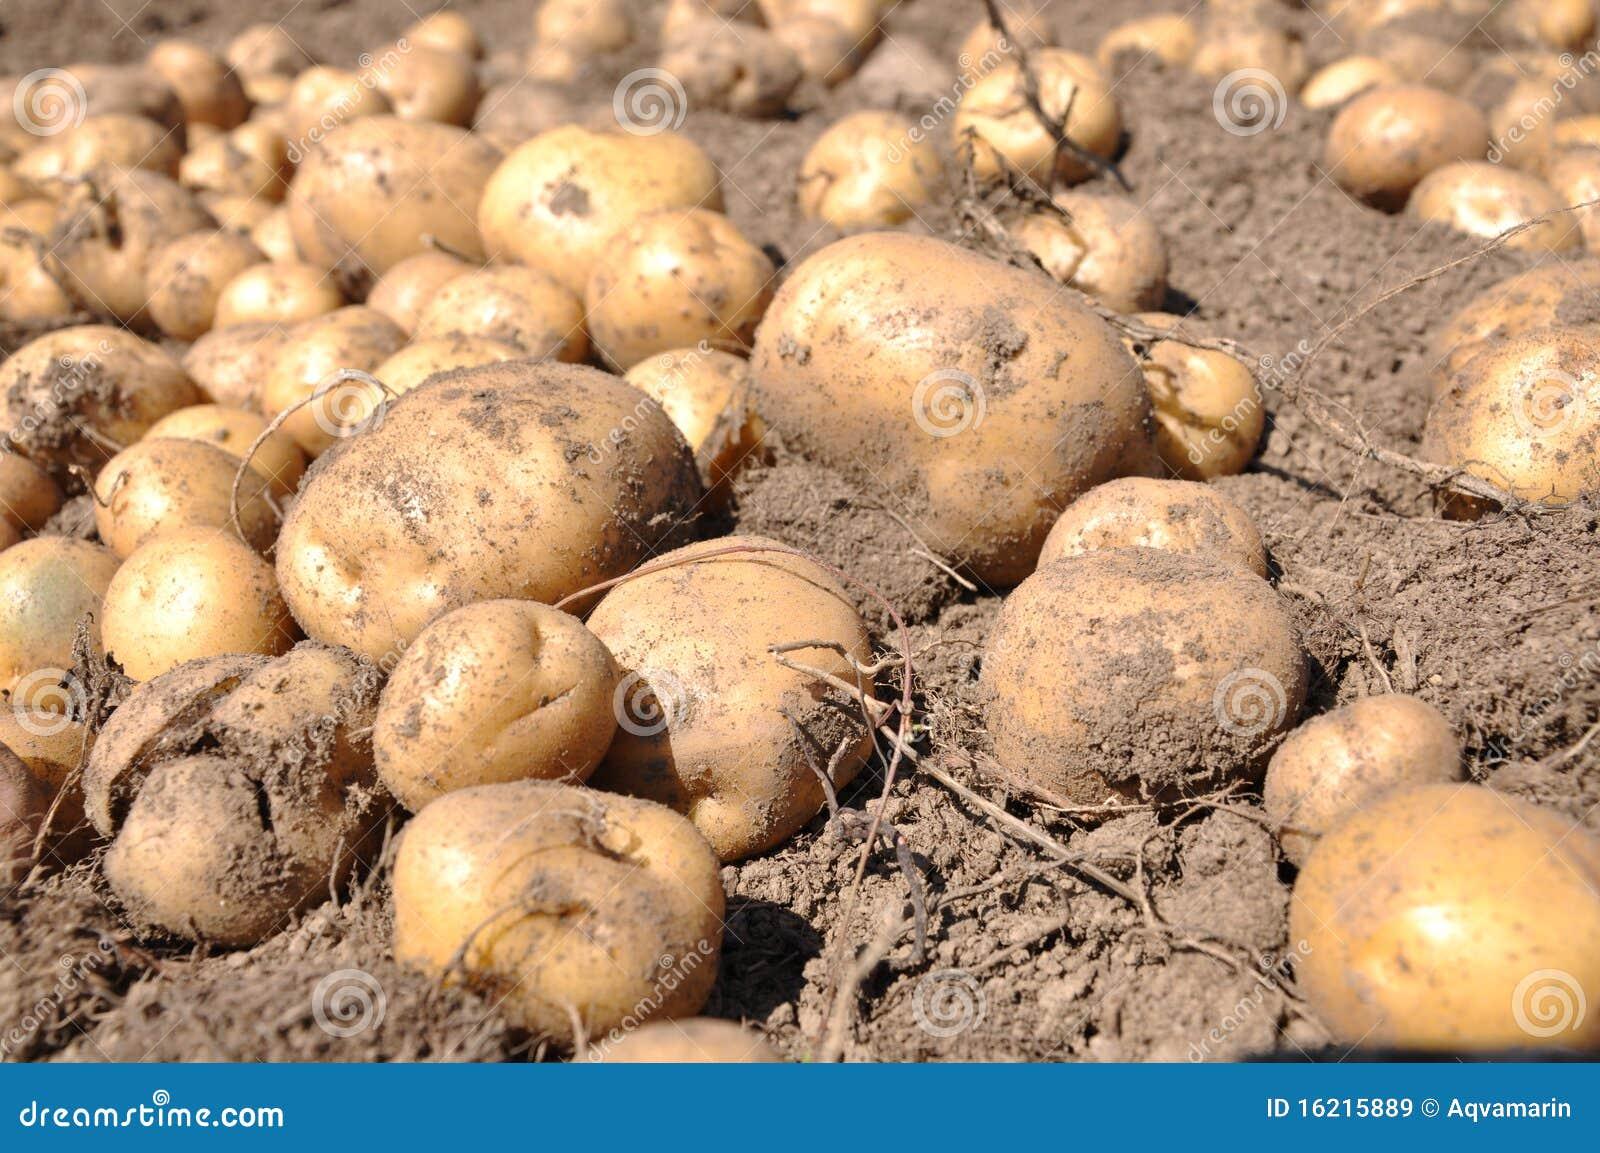 Potato Harvest Royalty Free Stock Images - Image: 16215889